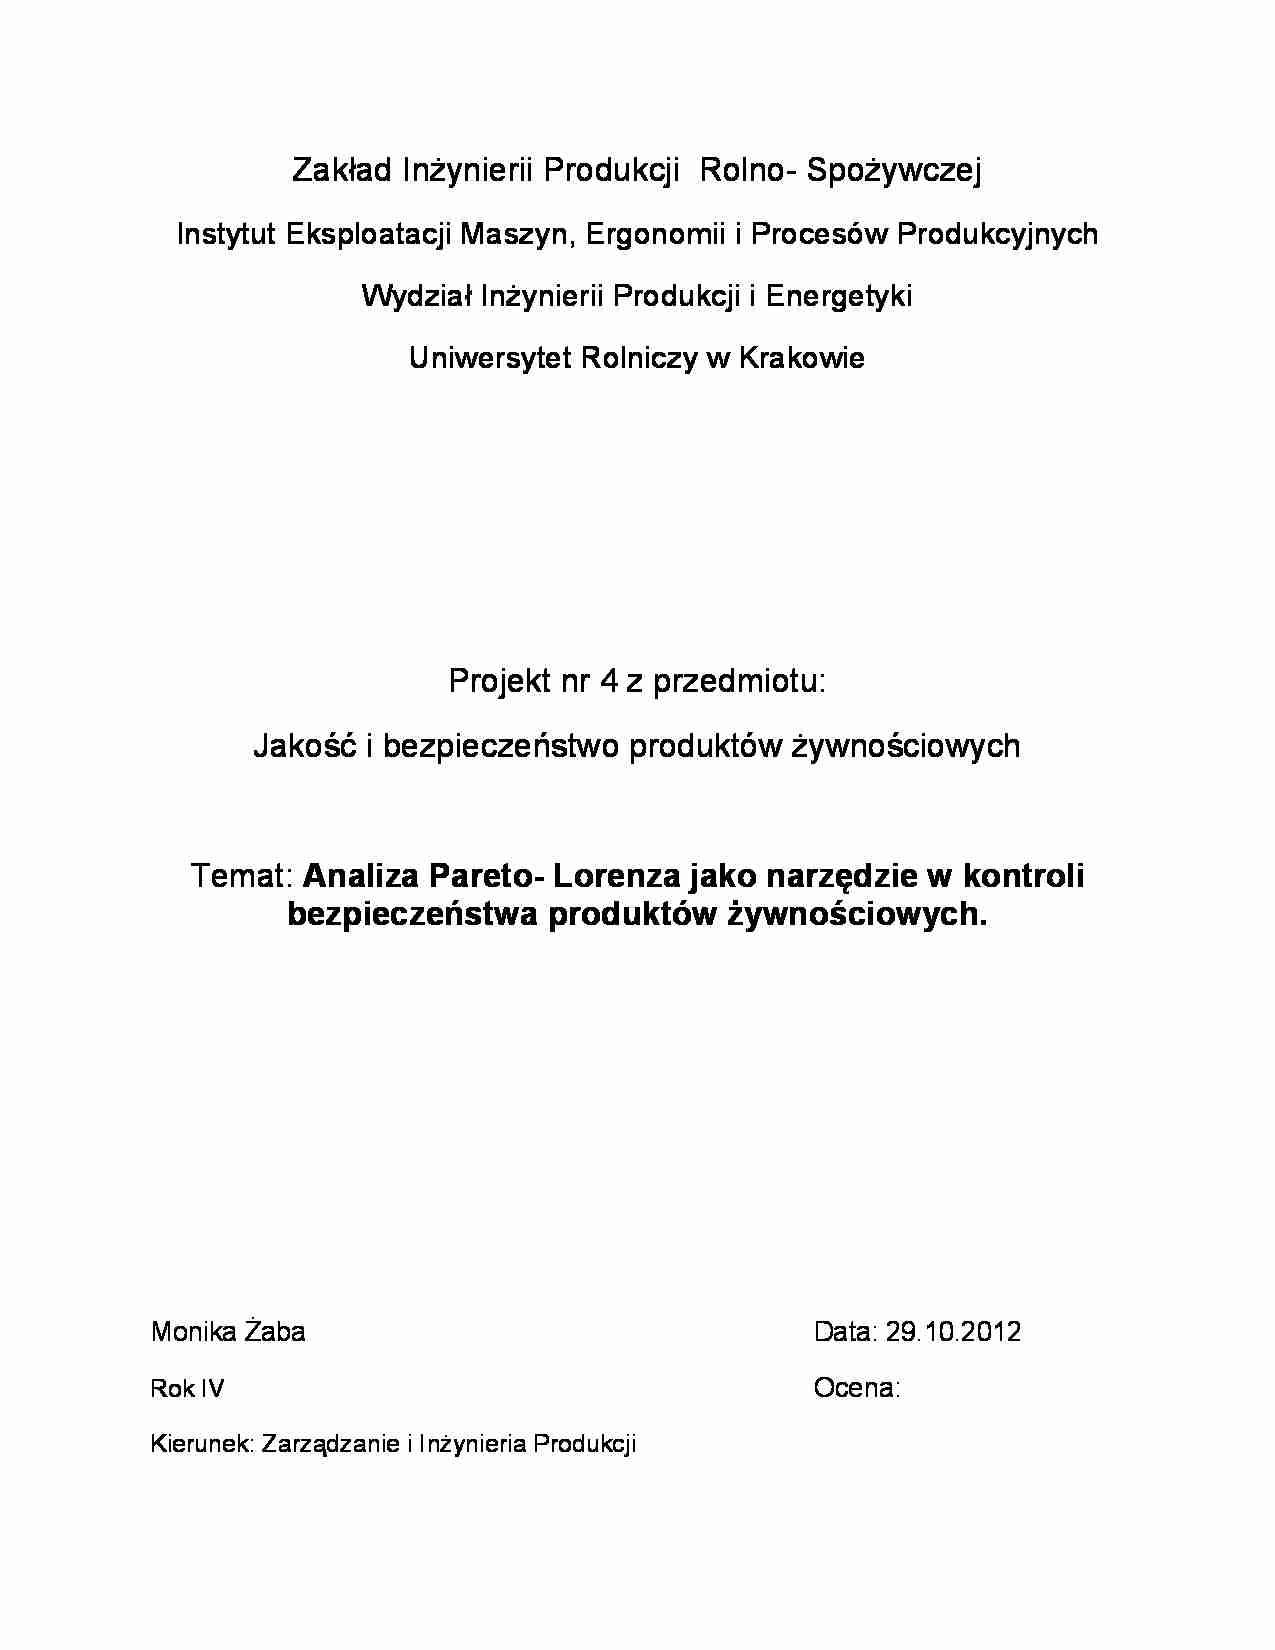 Analiza pareto lorenza wykres notatek podgld dokumentu analiza pareto lorenza wykres strona 1 ccuart Images